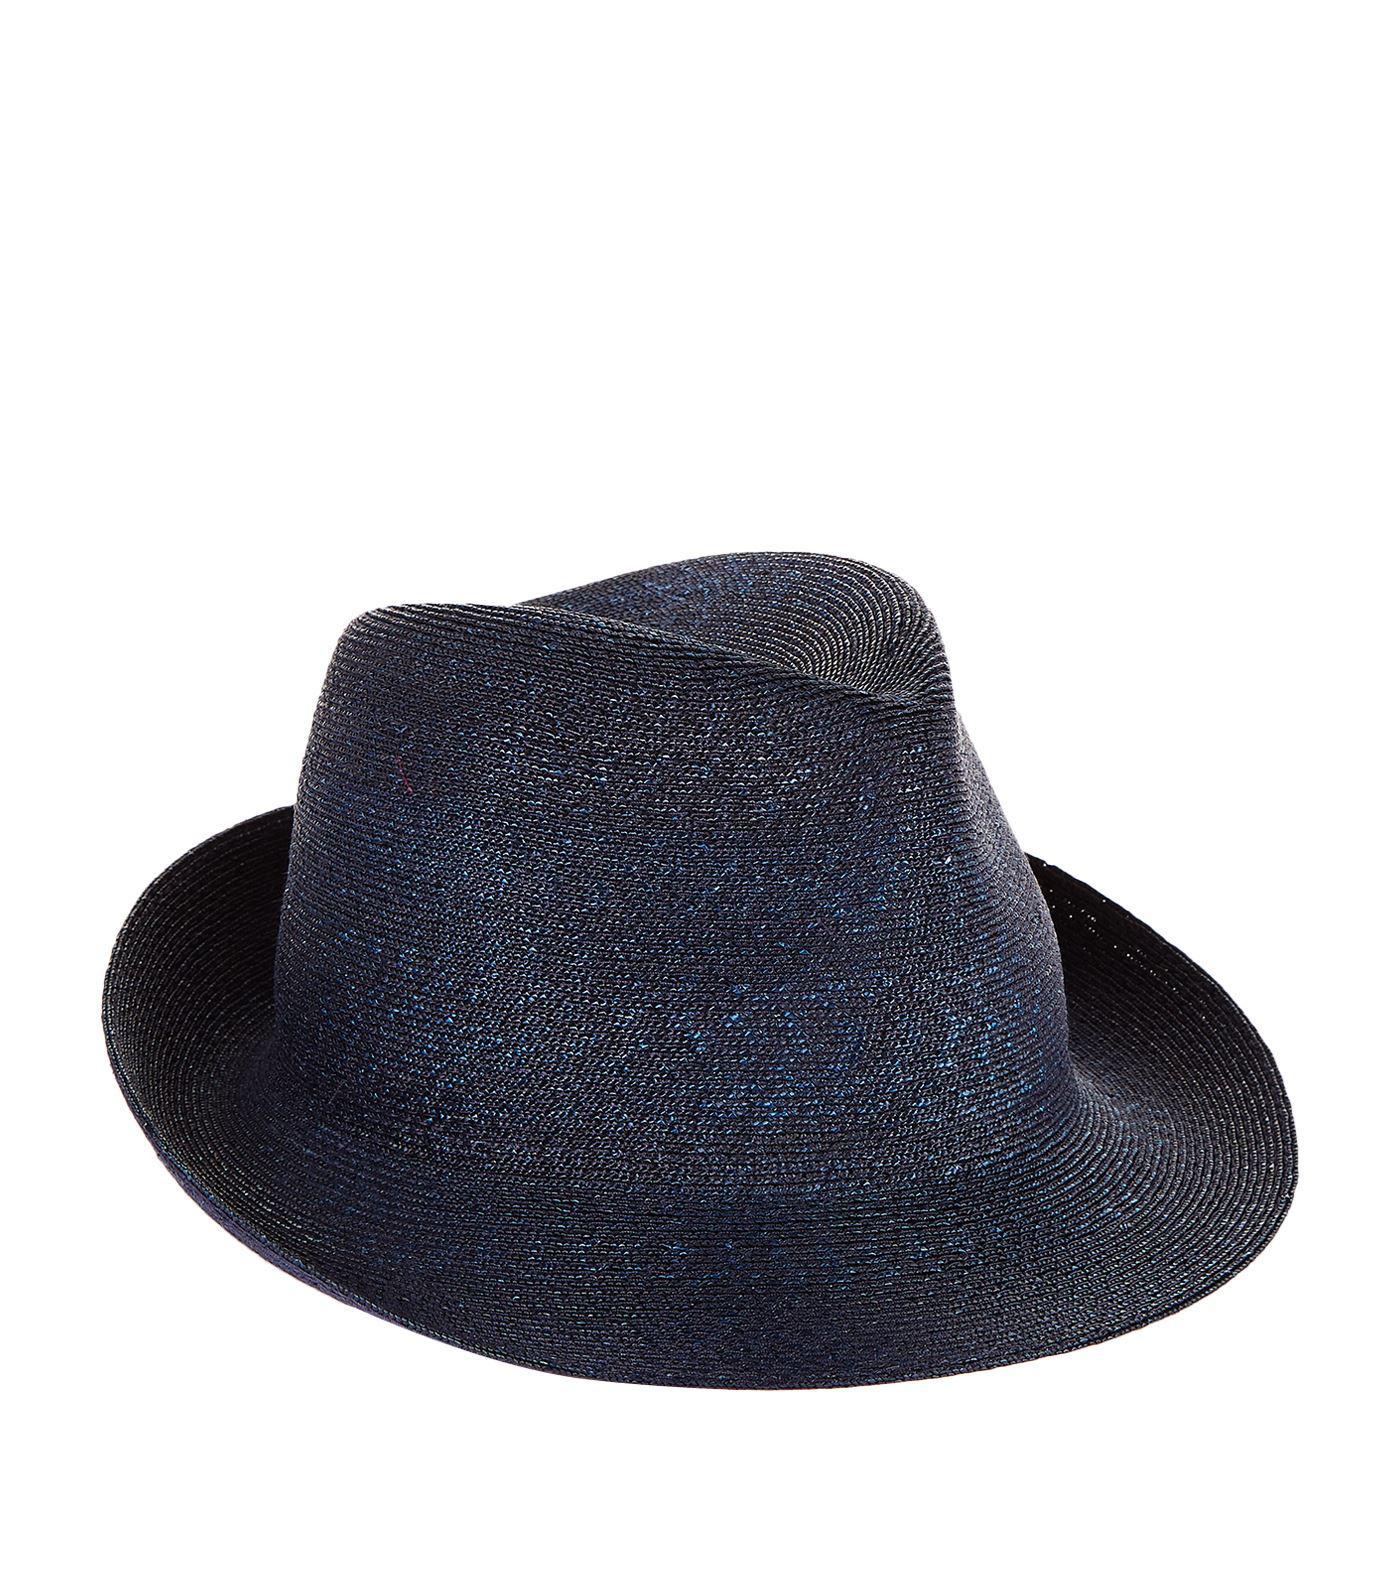 Philip Treacy Logo Pin Trilby Hat in Blue for Men - Lyst f6b767f38c71